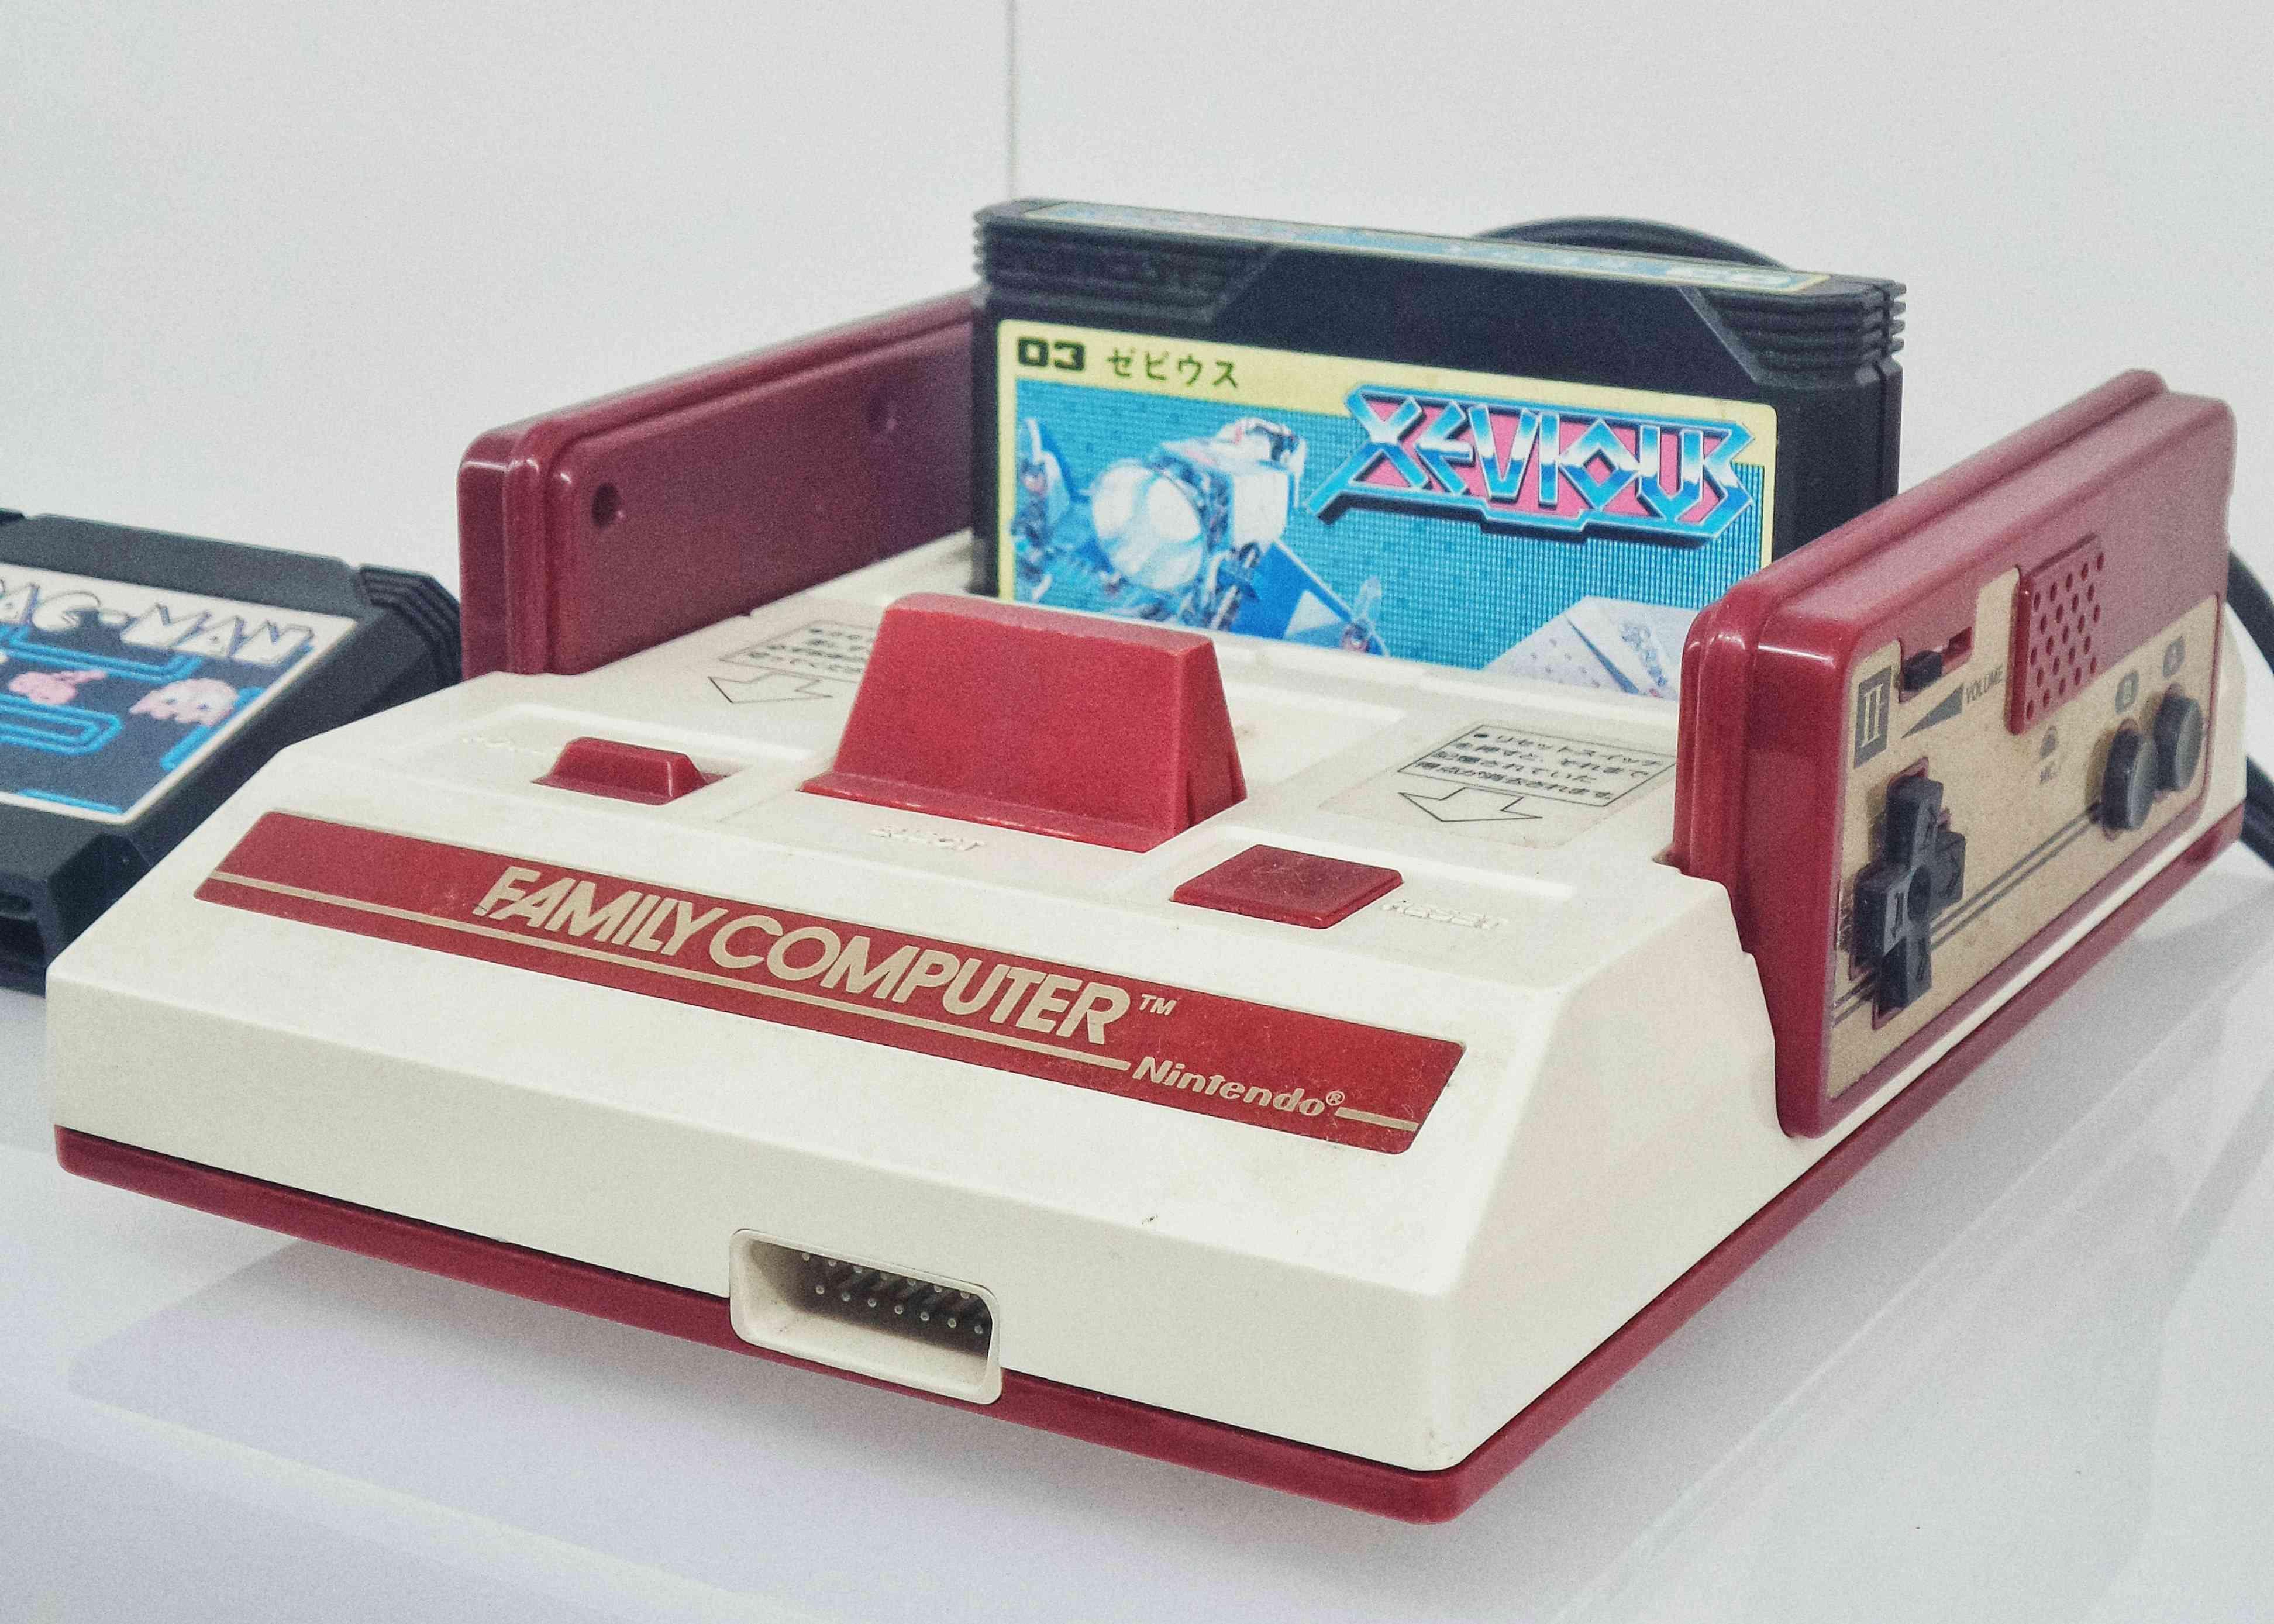 A retro Nintendo gaming system called